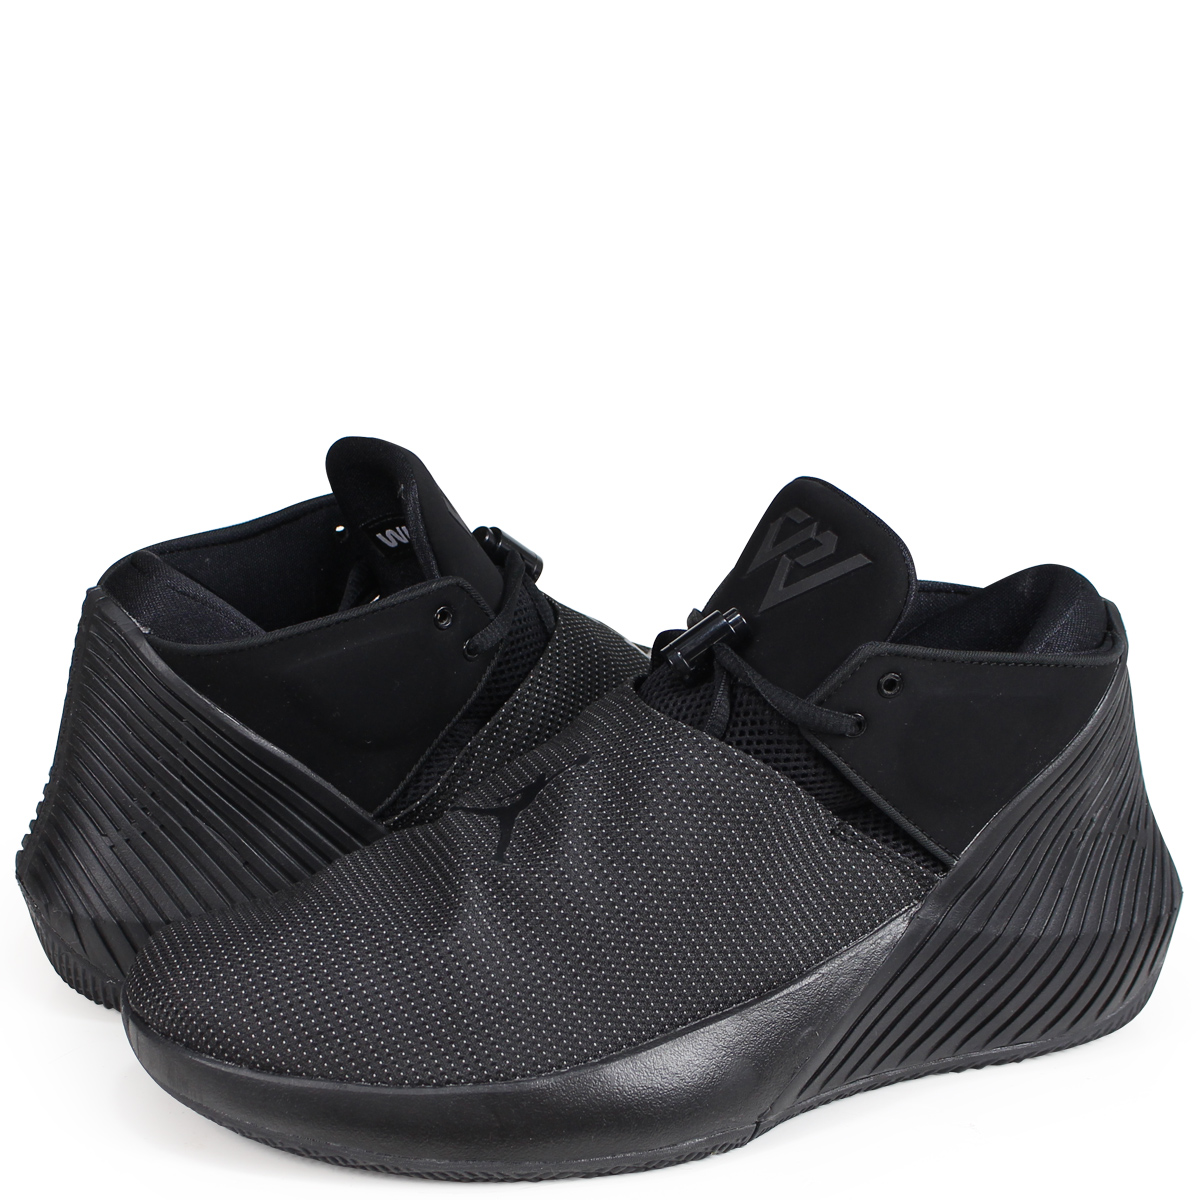 d365daa22da ... closer at 000a3 7691c NIKE JORDAN WHY NOT ZER0.1 LOW PFX Nike Air Jordan  ...